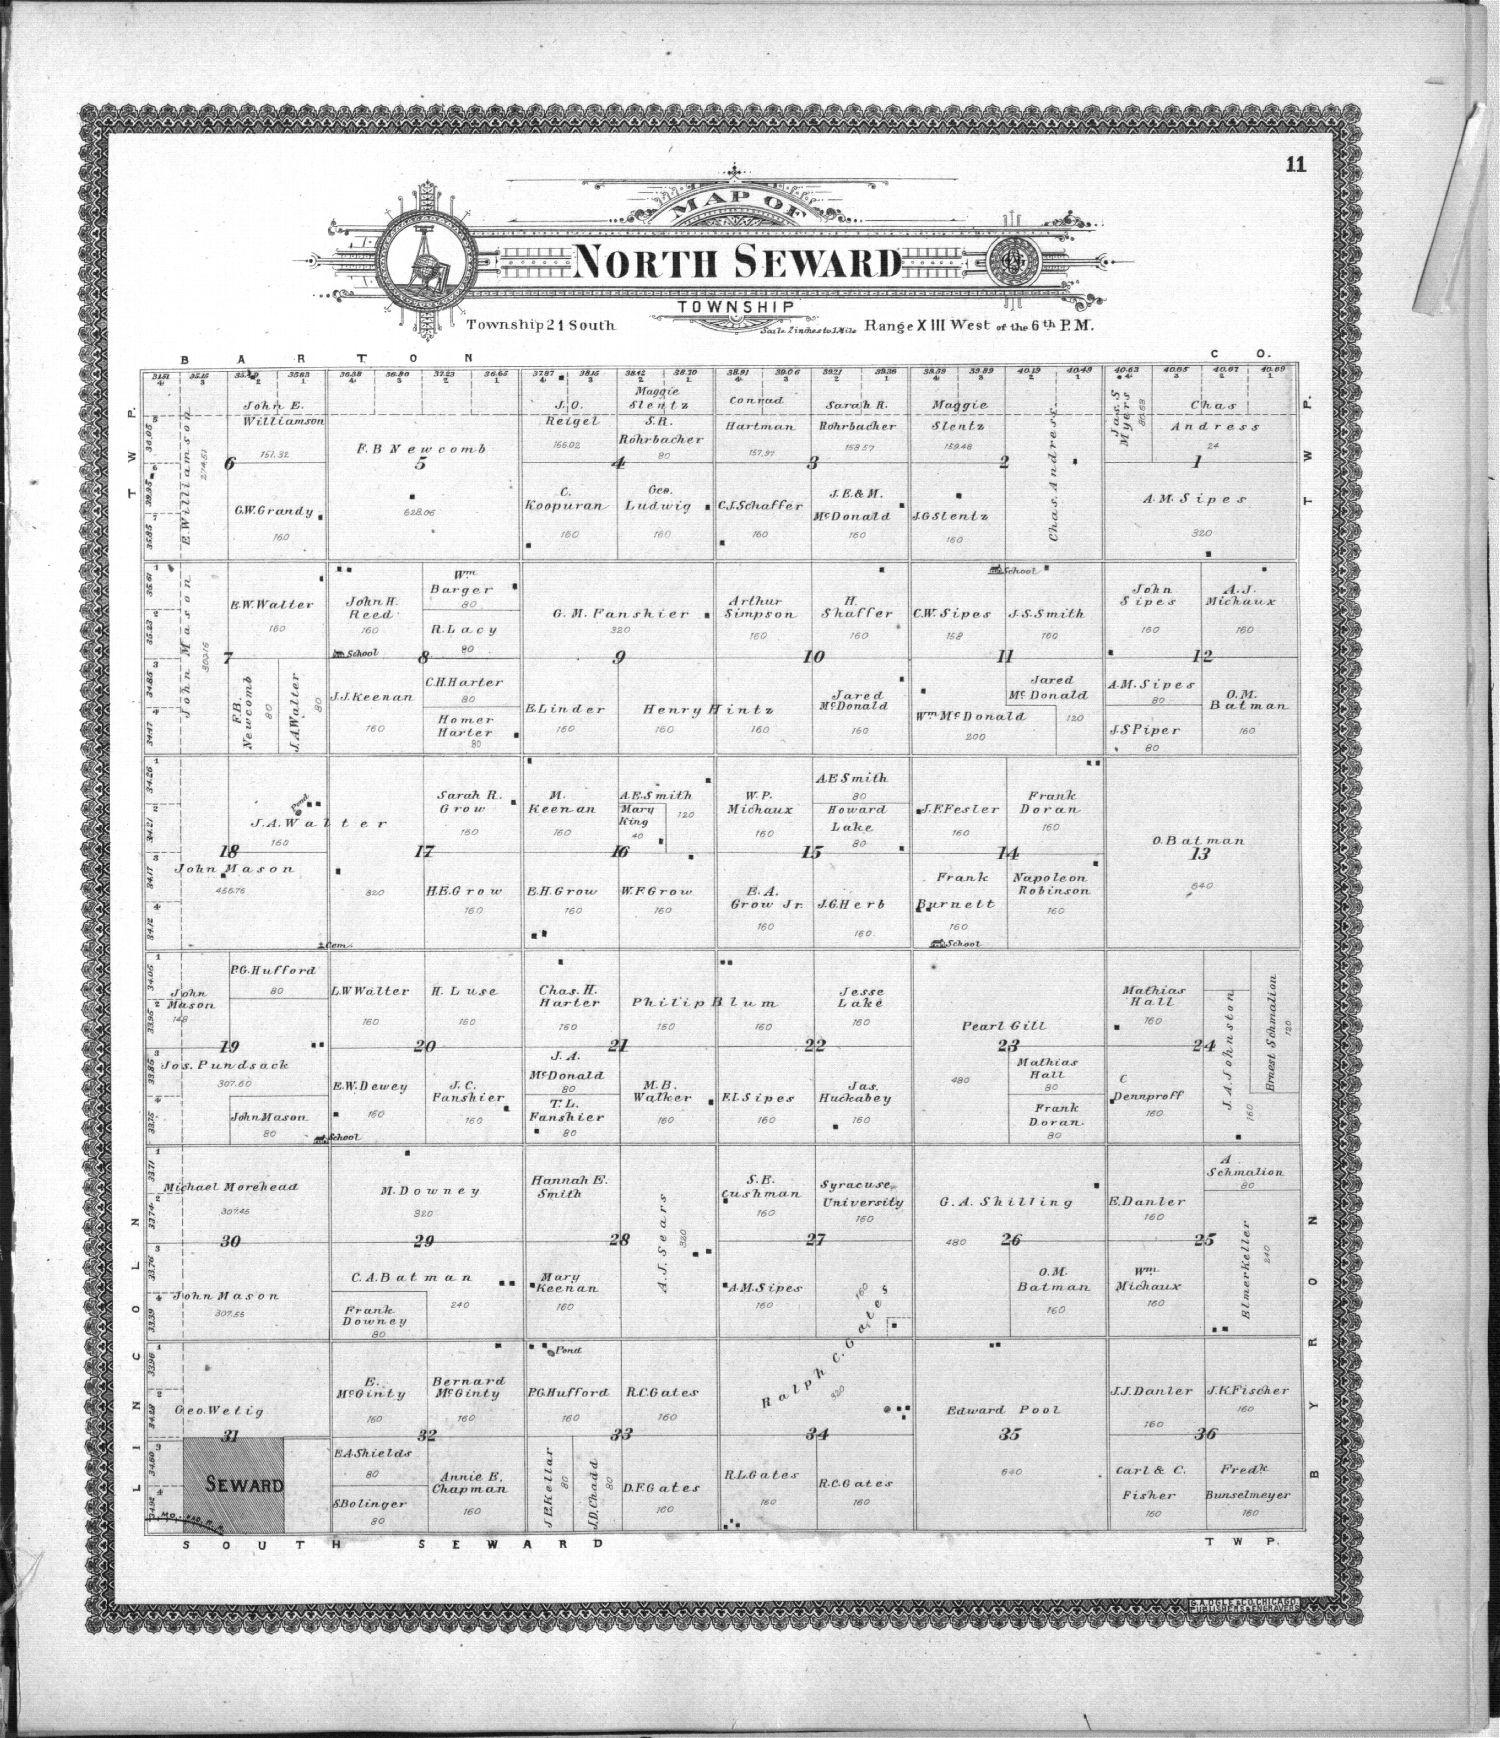 Standard atlas of Stafford County, Kansas - 11